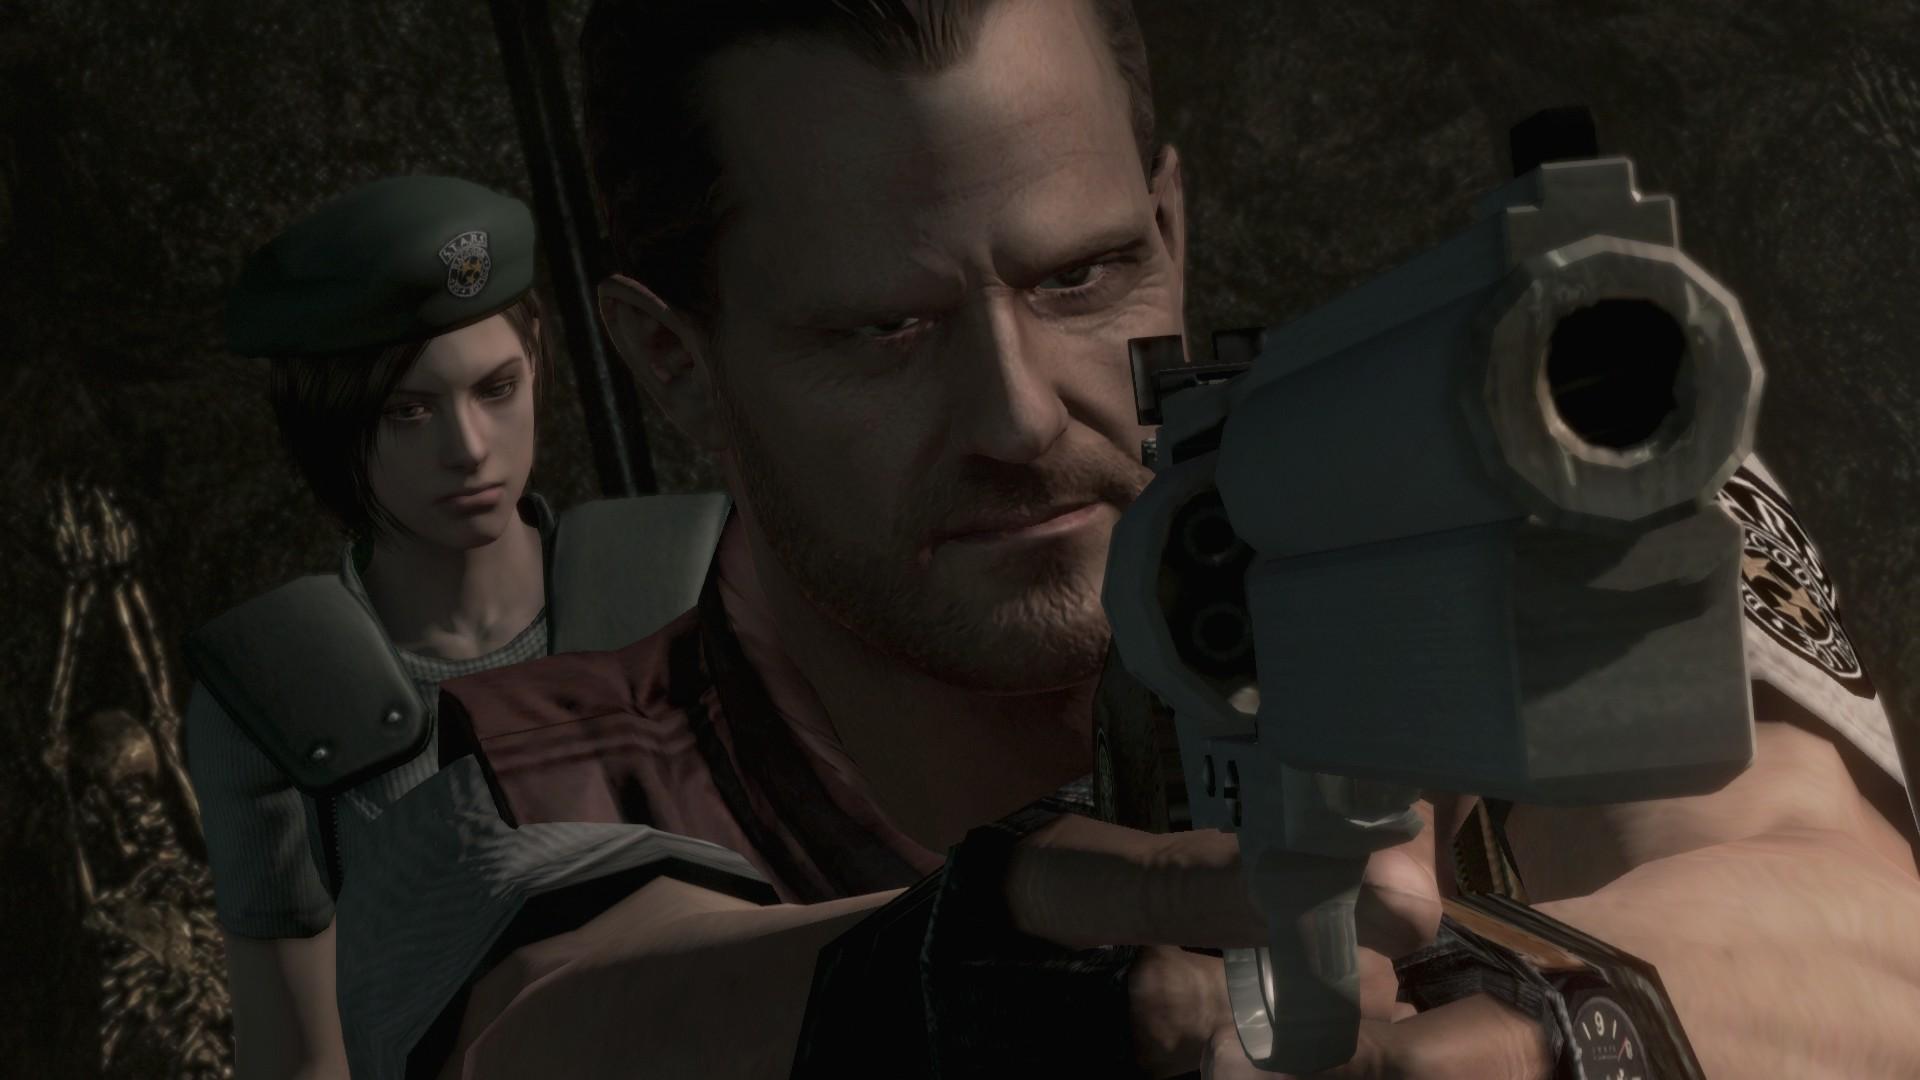 Resident Evil HD REMASTER - corepacks - 4.26 GB Free Download